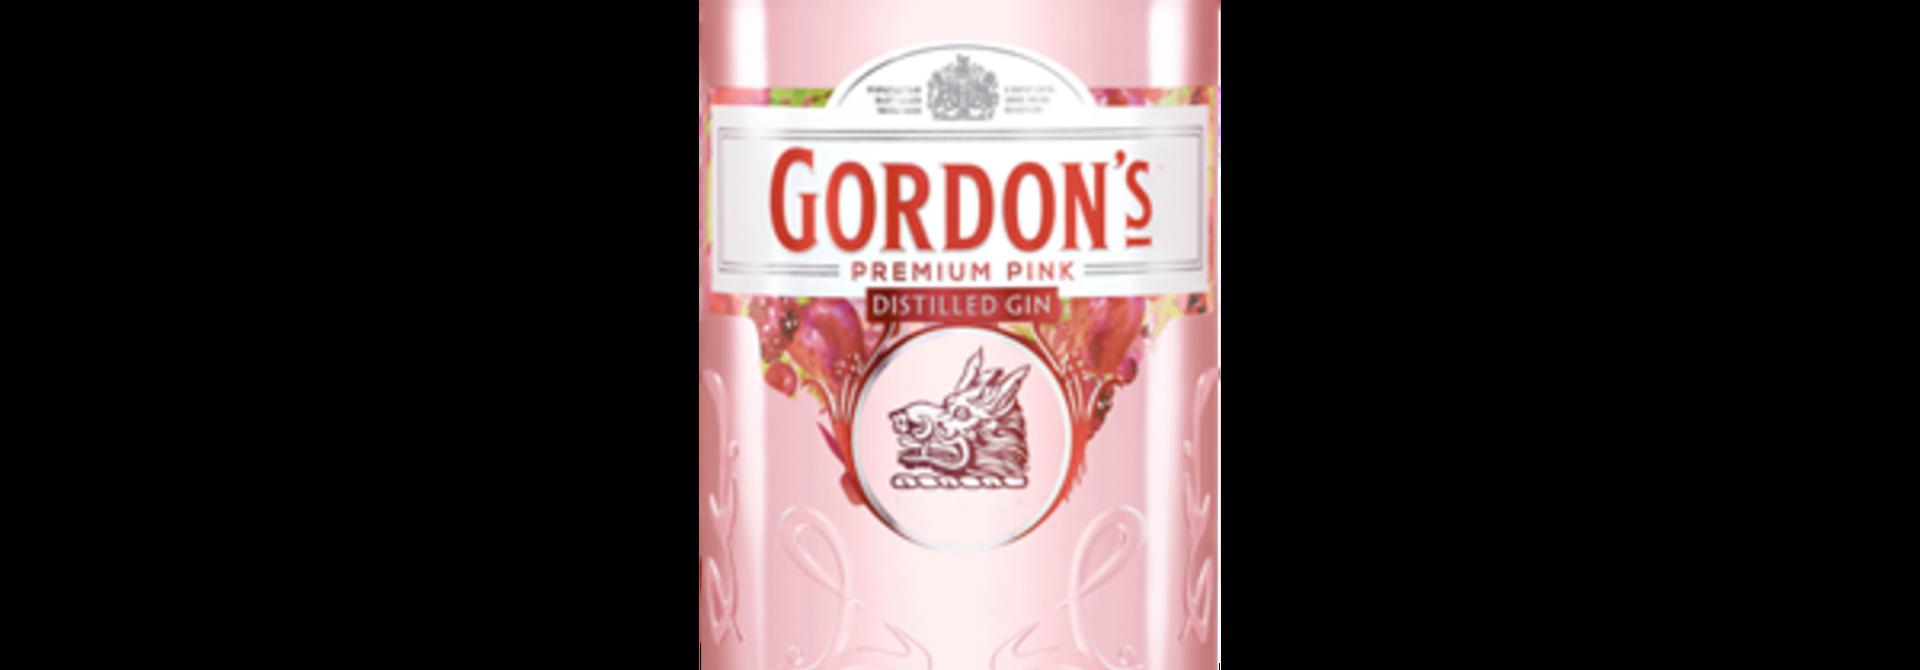 GORDON Pink gin 0.7ltr